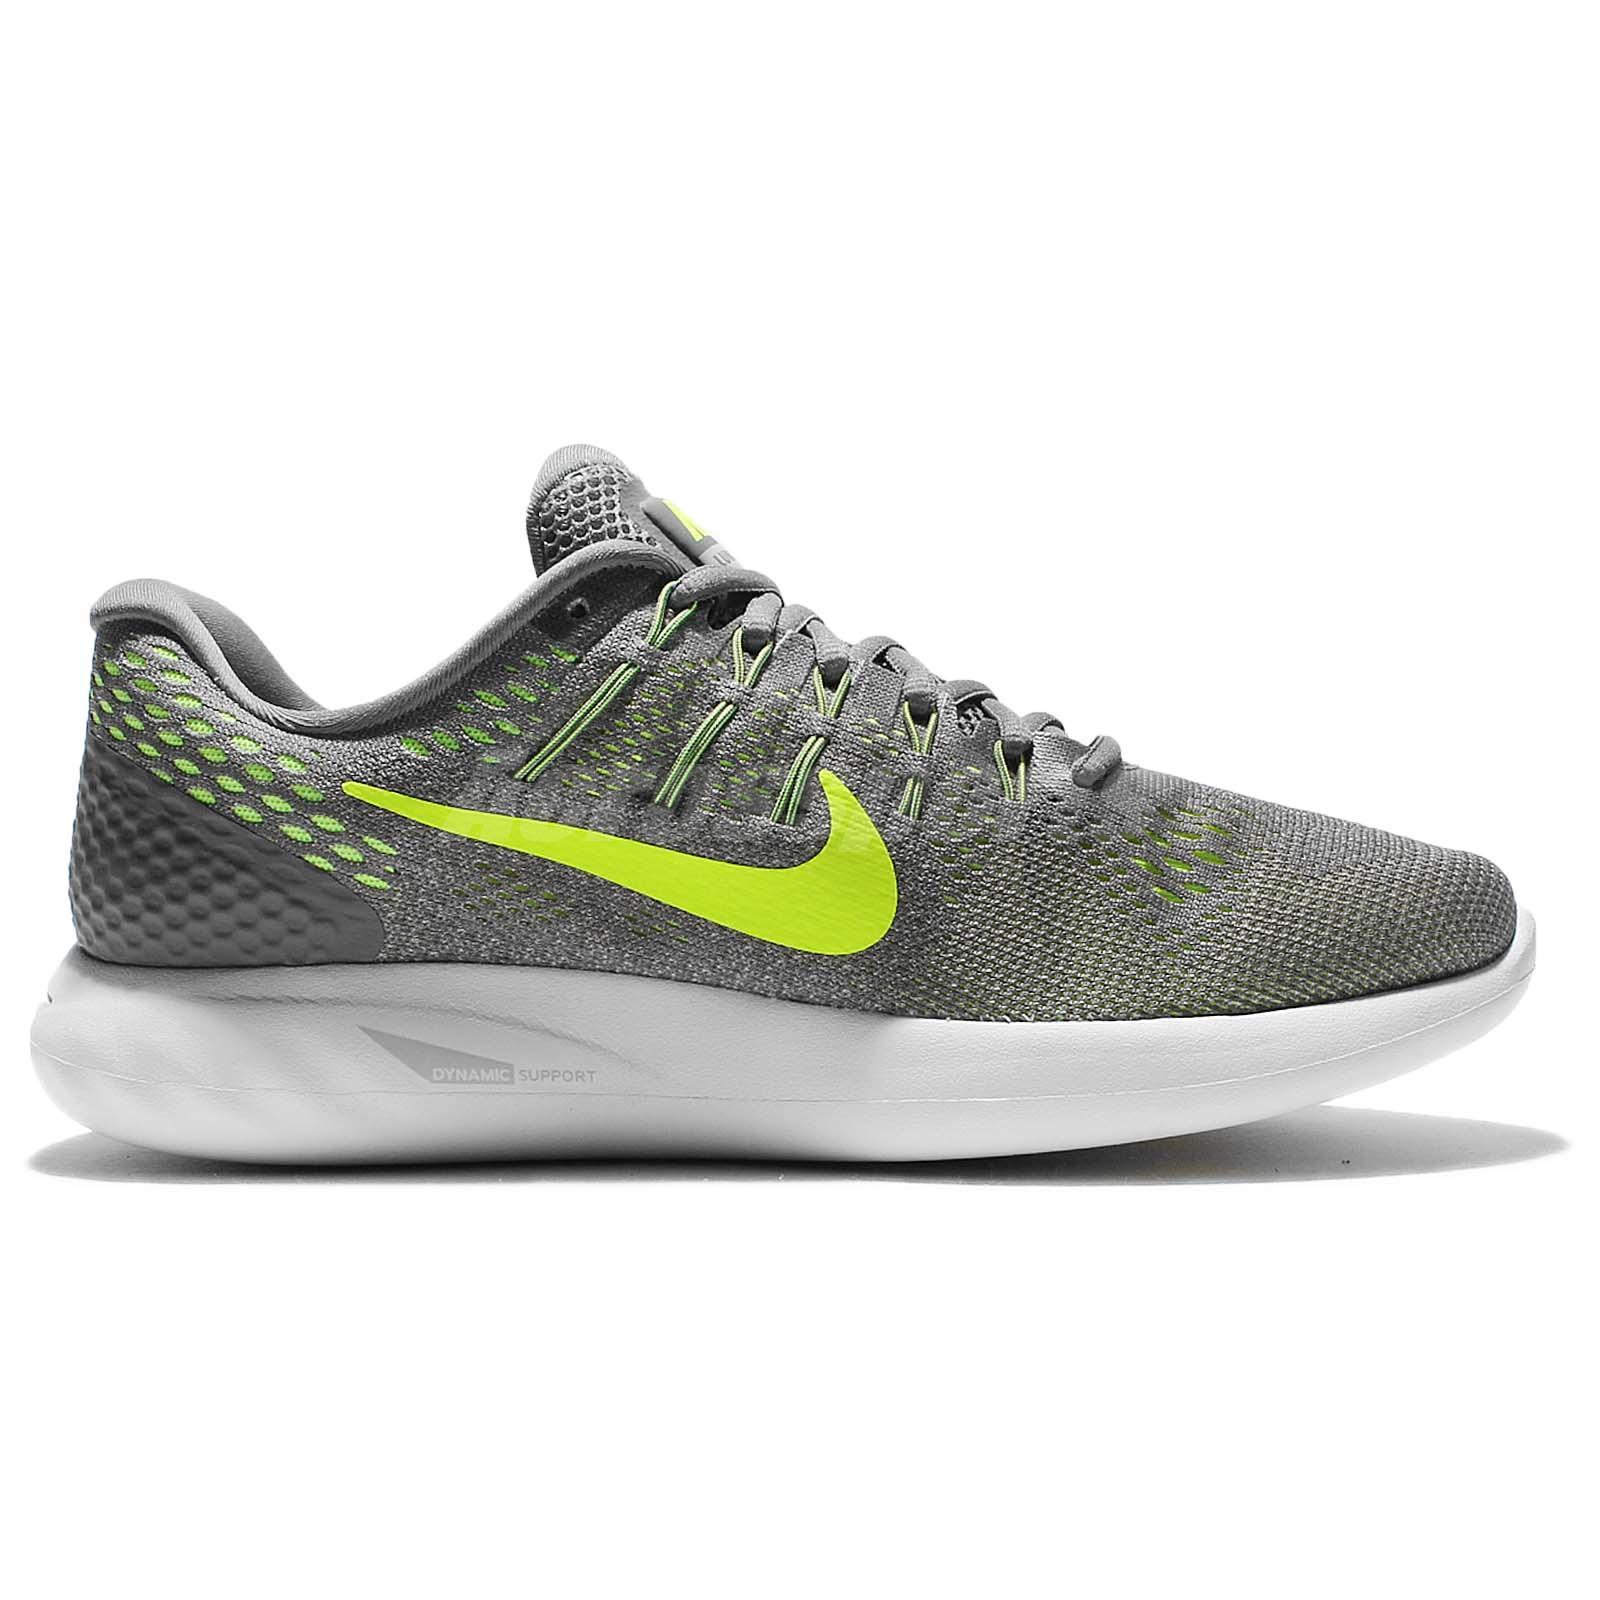 a11add9862dc27 Nike Lunarswift 2 Mens Running Shoes Nike Casual Shoes For Men